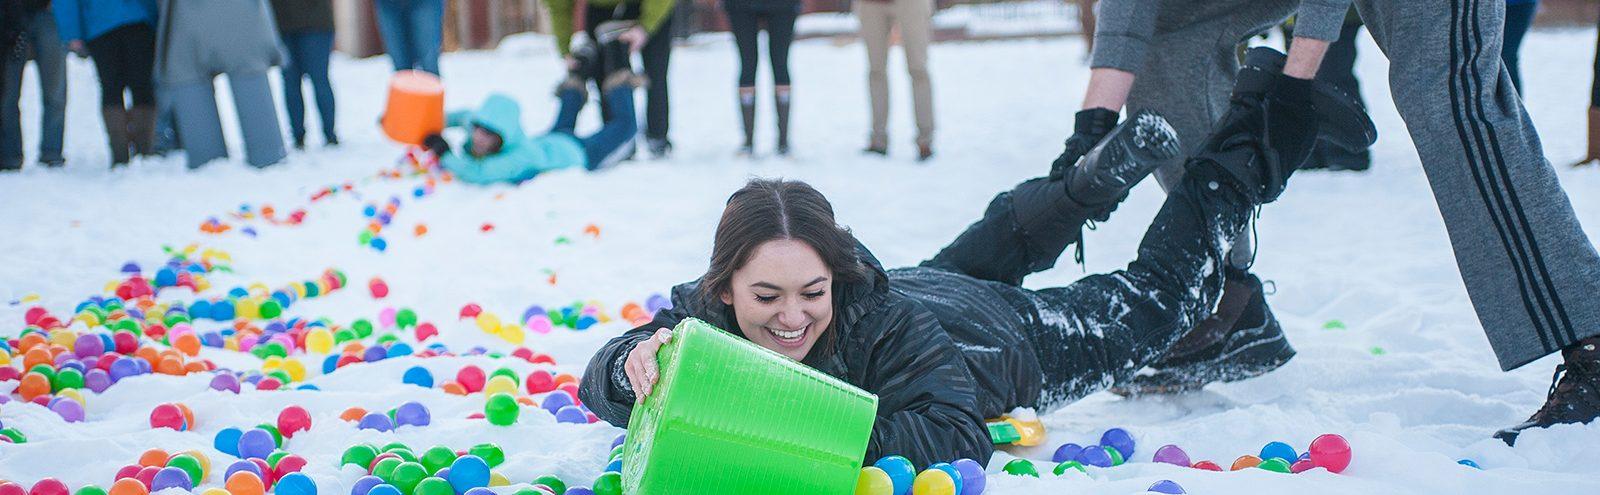 Northland College Snowfest 2016